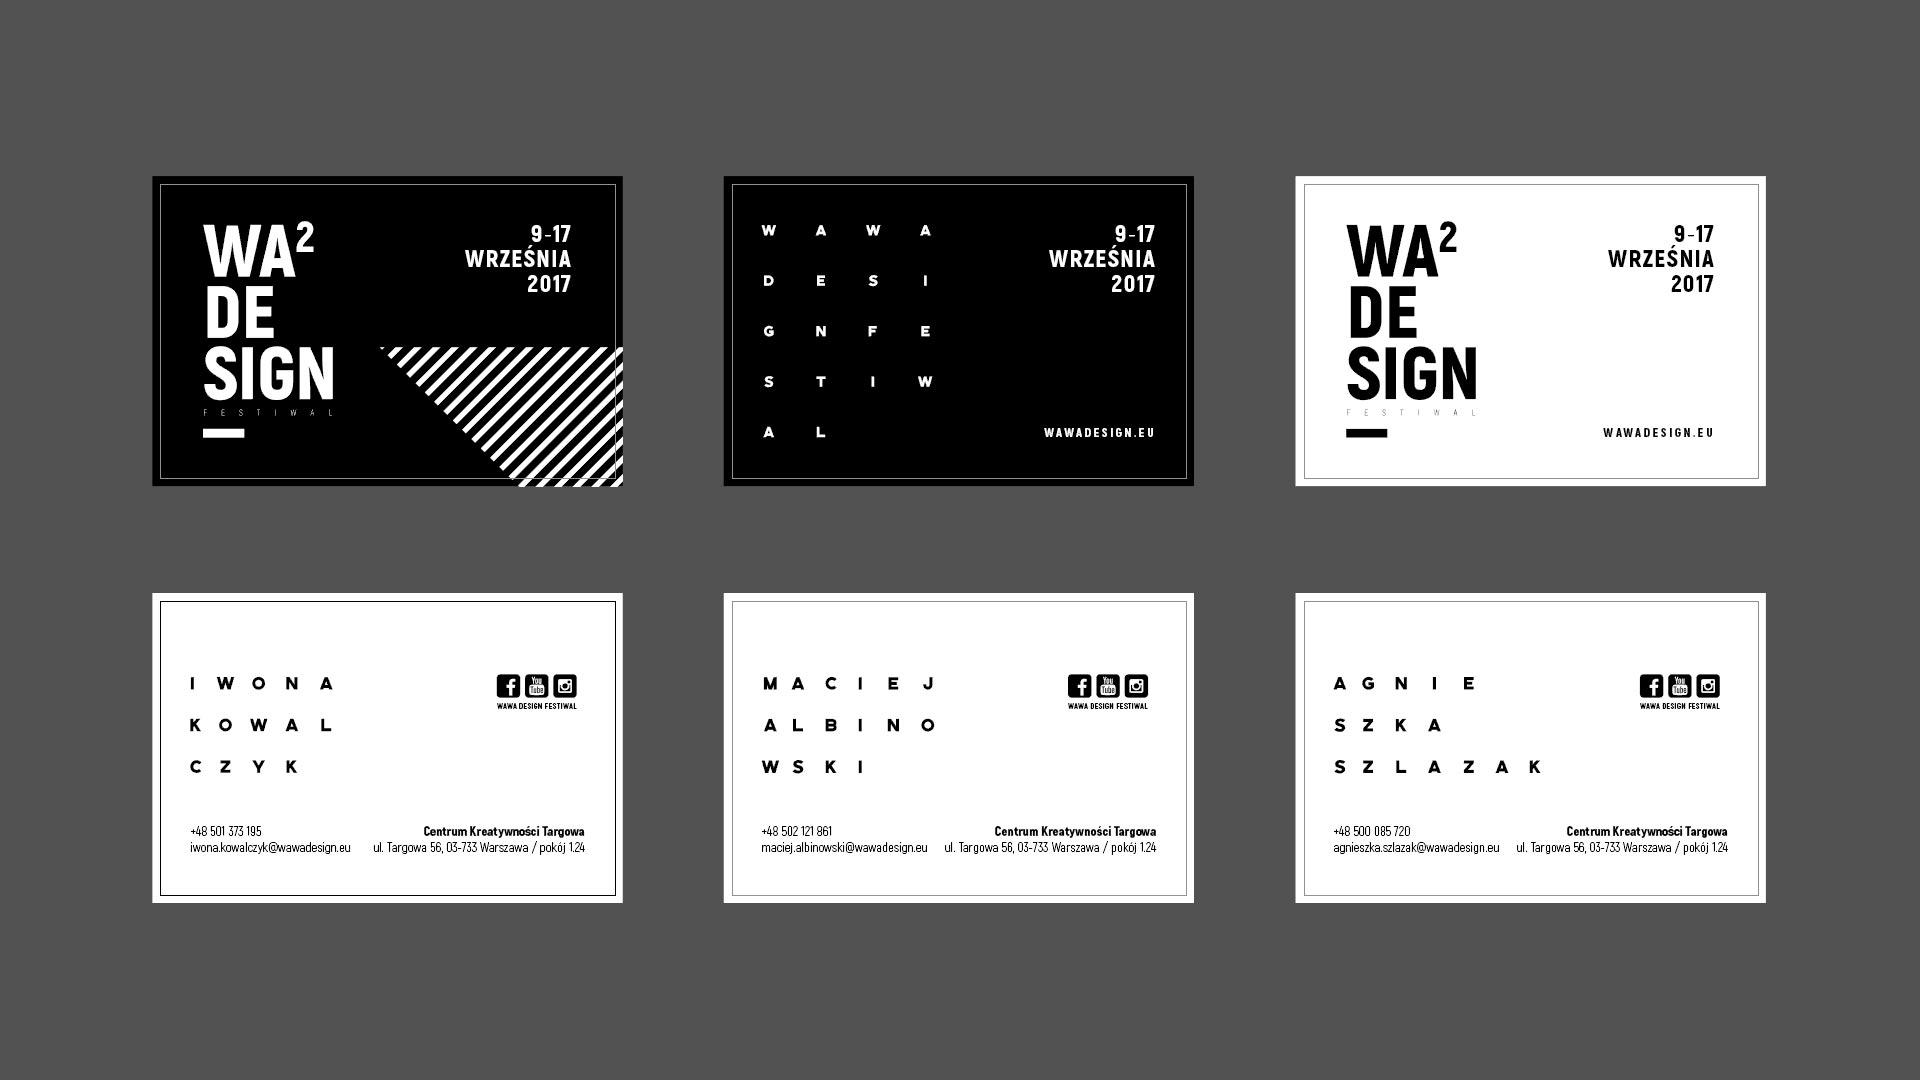 WA2 Design Festiwal